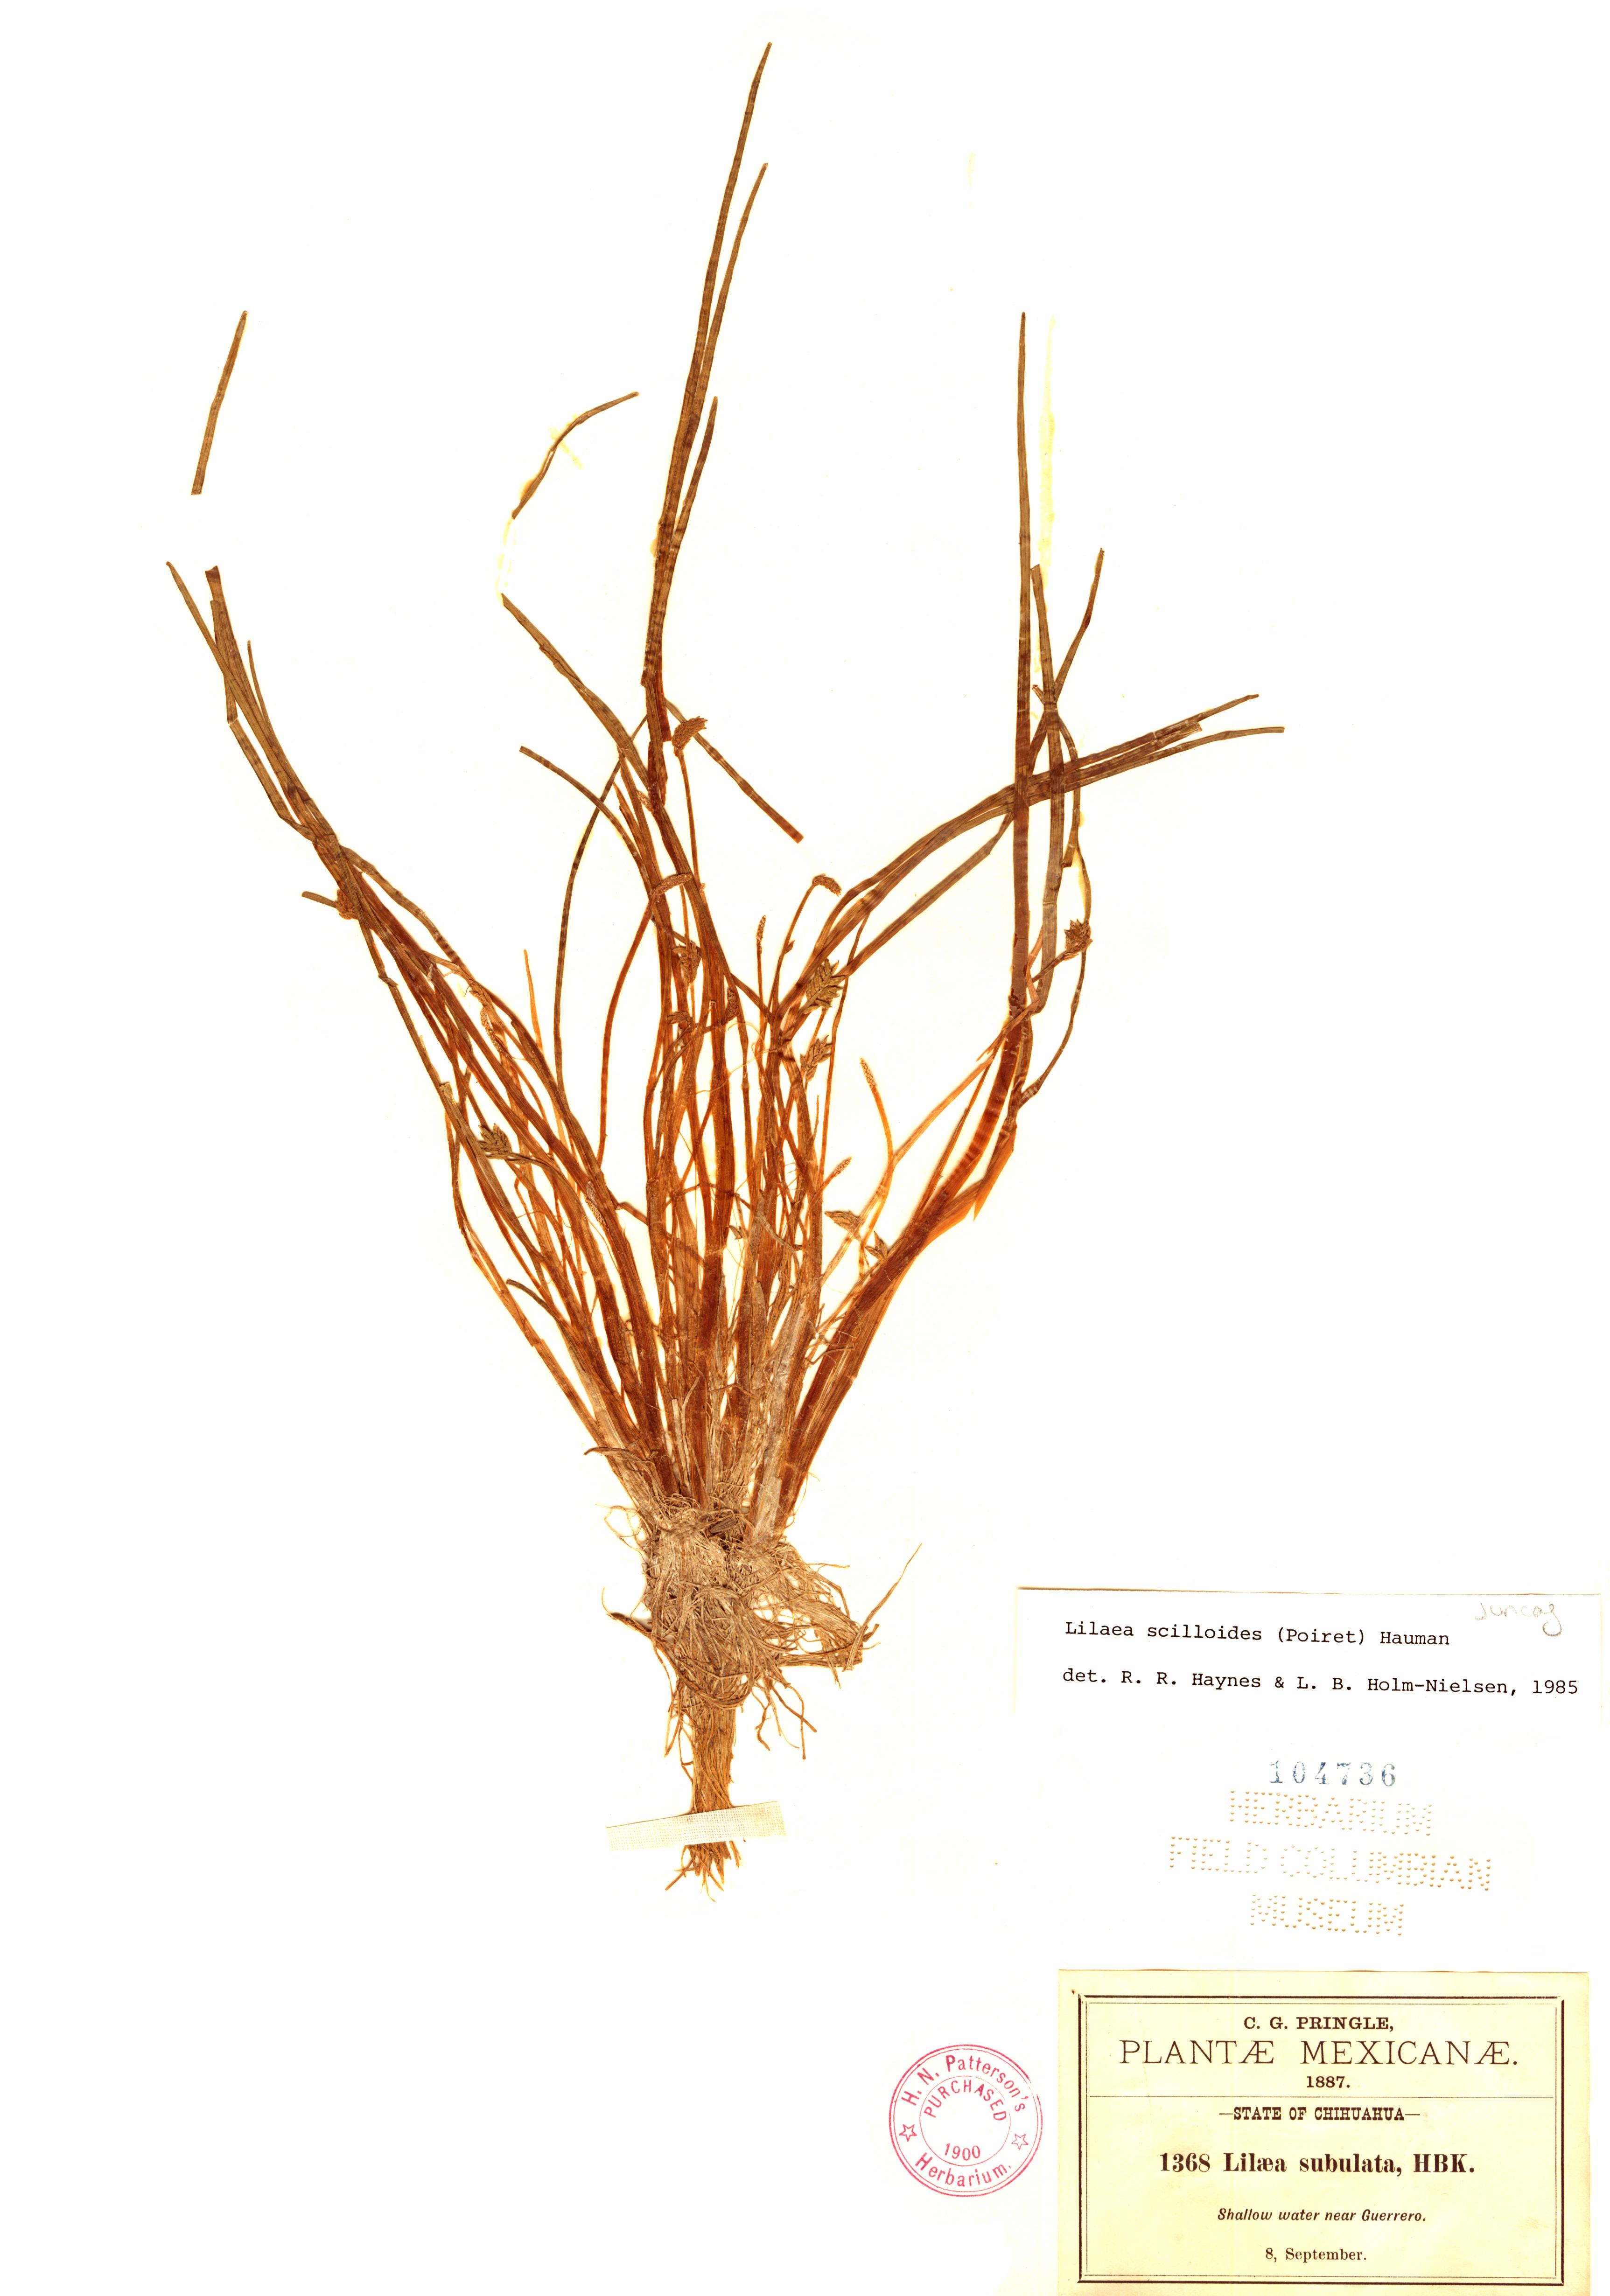 Specimen: Lilaea scilloides